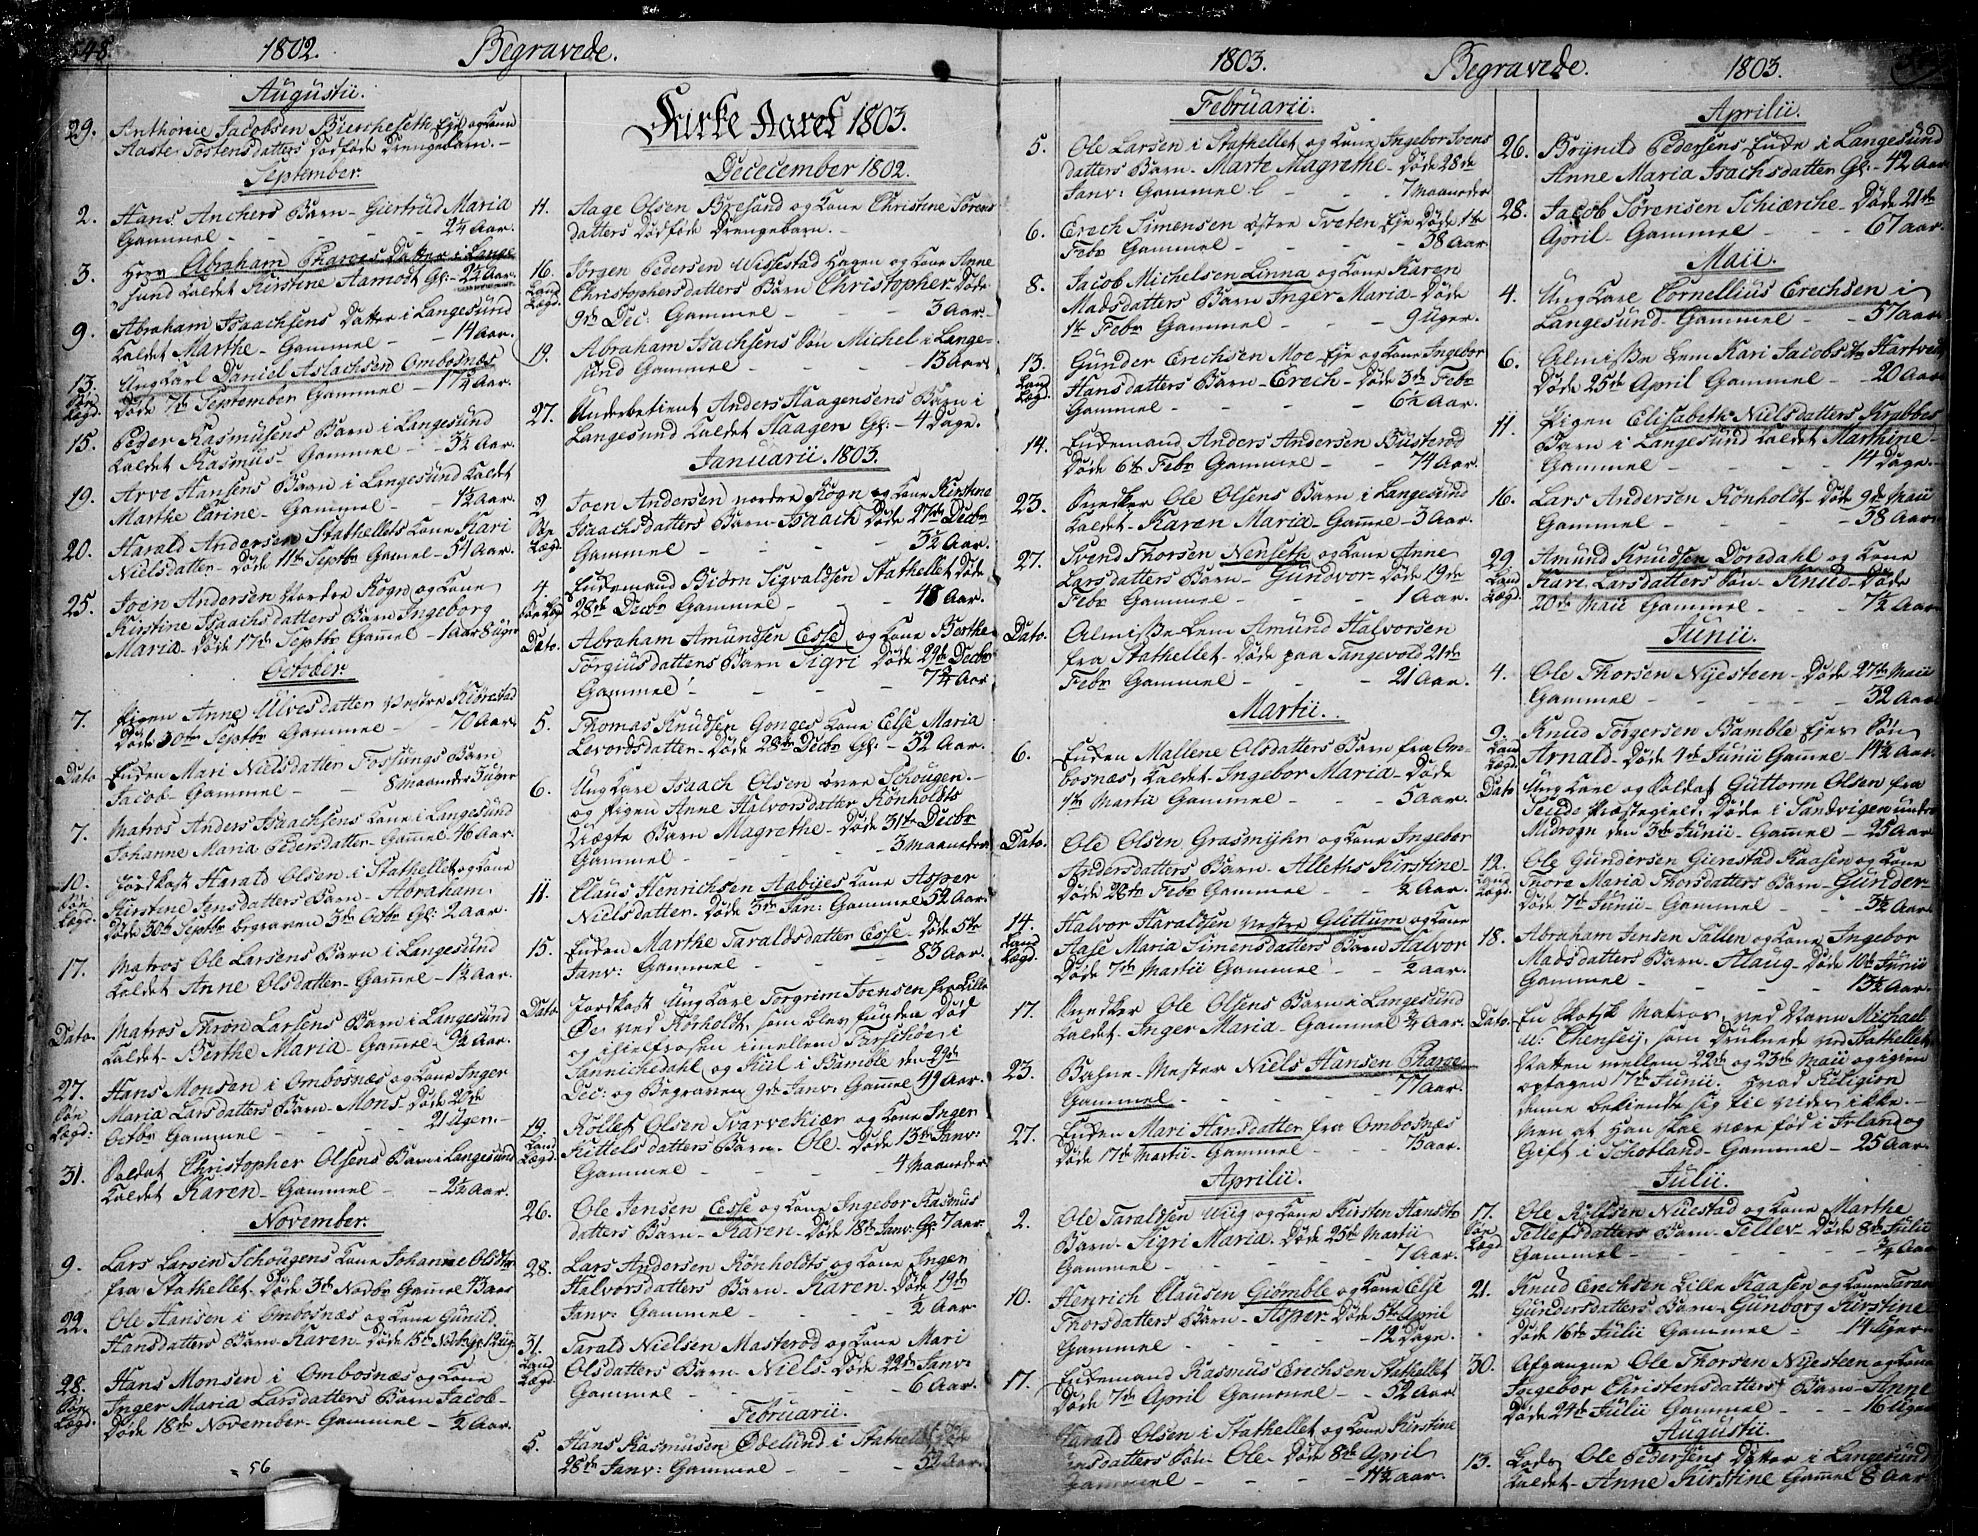 SAKO, Bamble kirkebøker, F/Fa/L0002: Ministerialbok nr. I 2, 1775-1814, s. 548-549